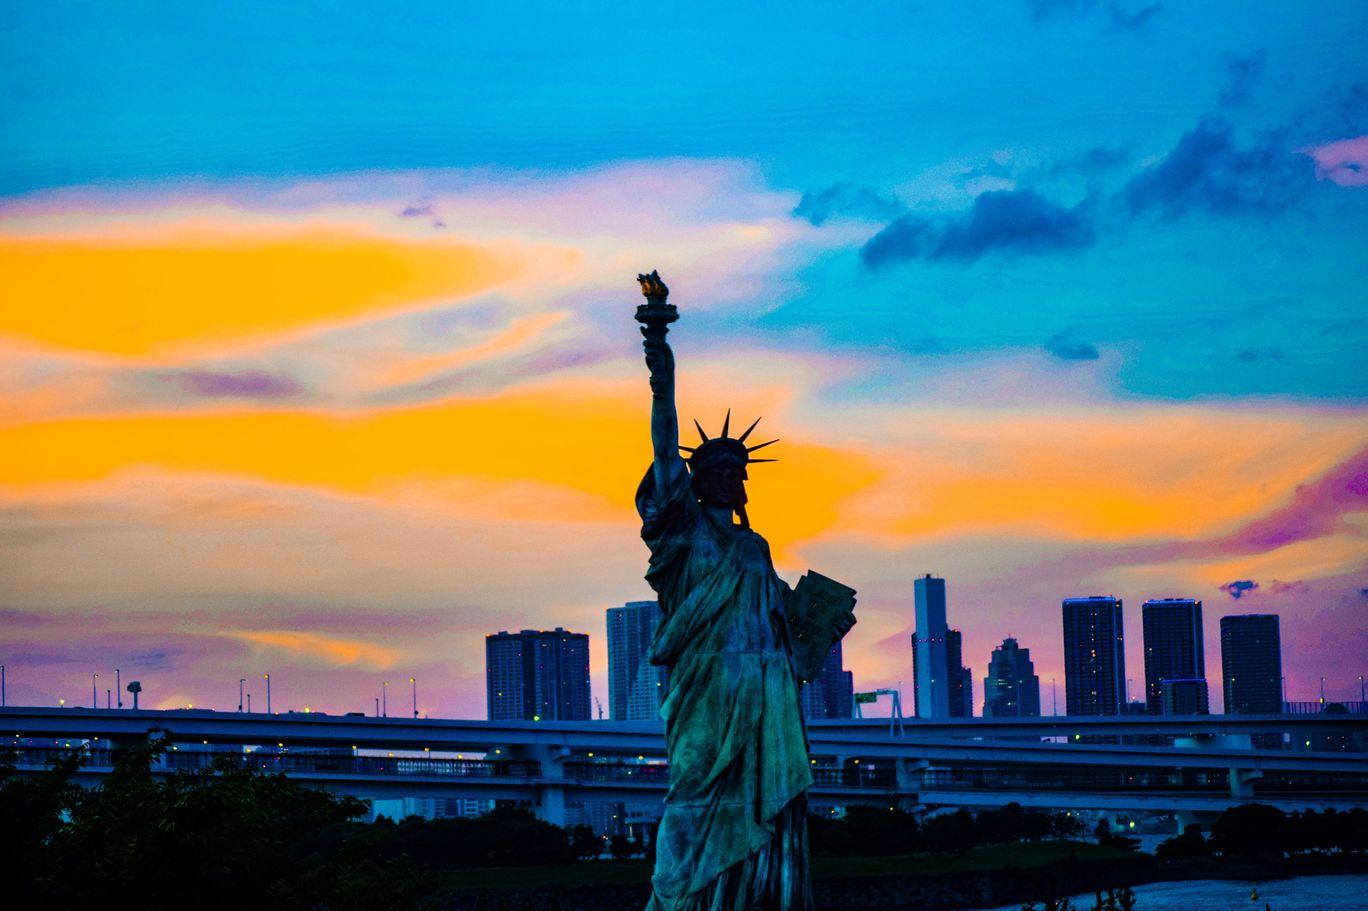 Photo of Odaiba Statue of Liberty By Priyanka Gandhi